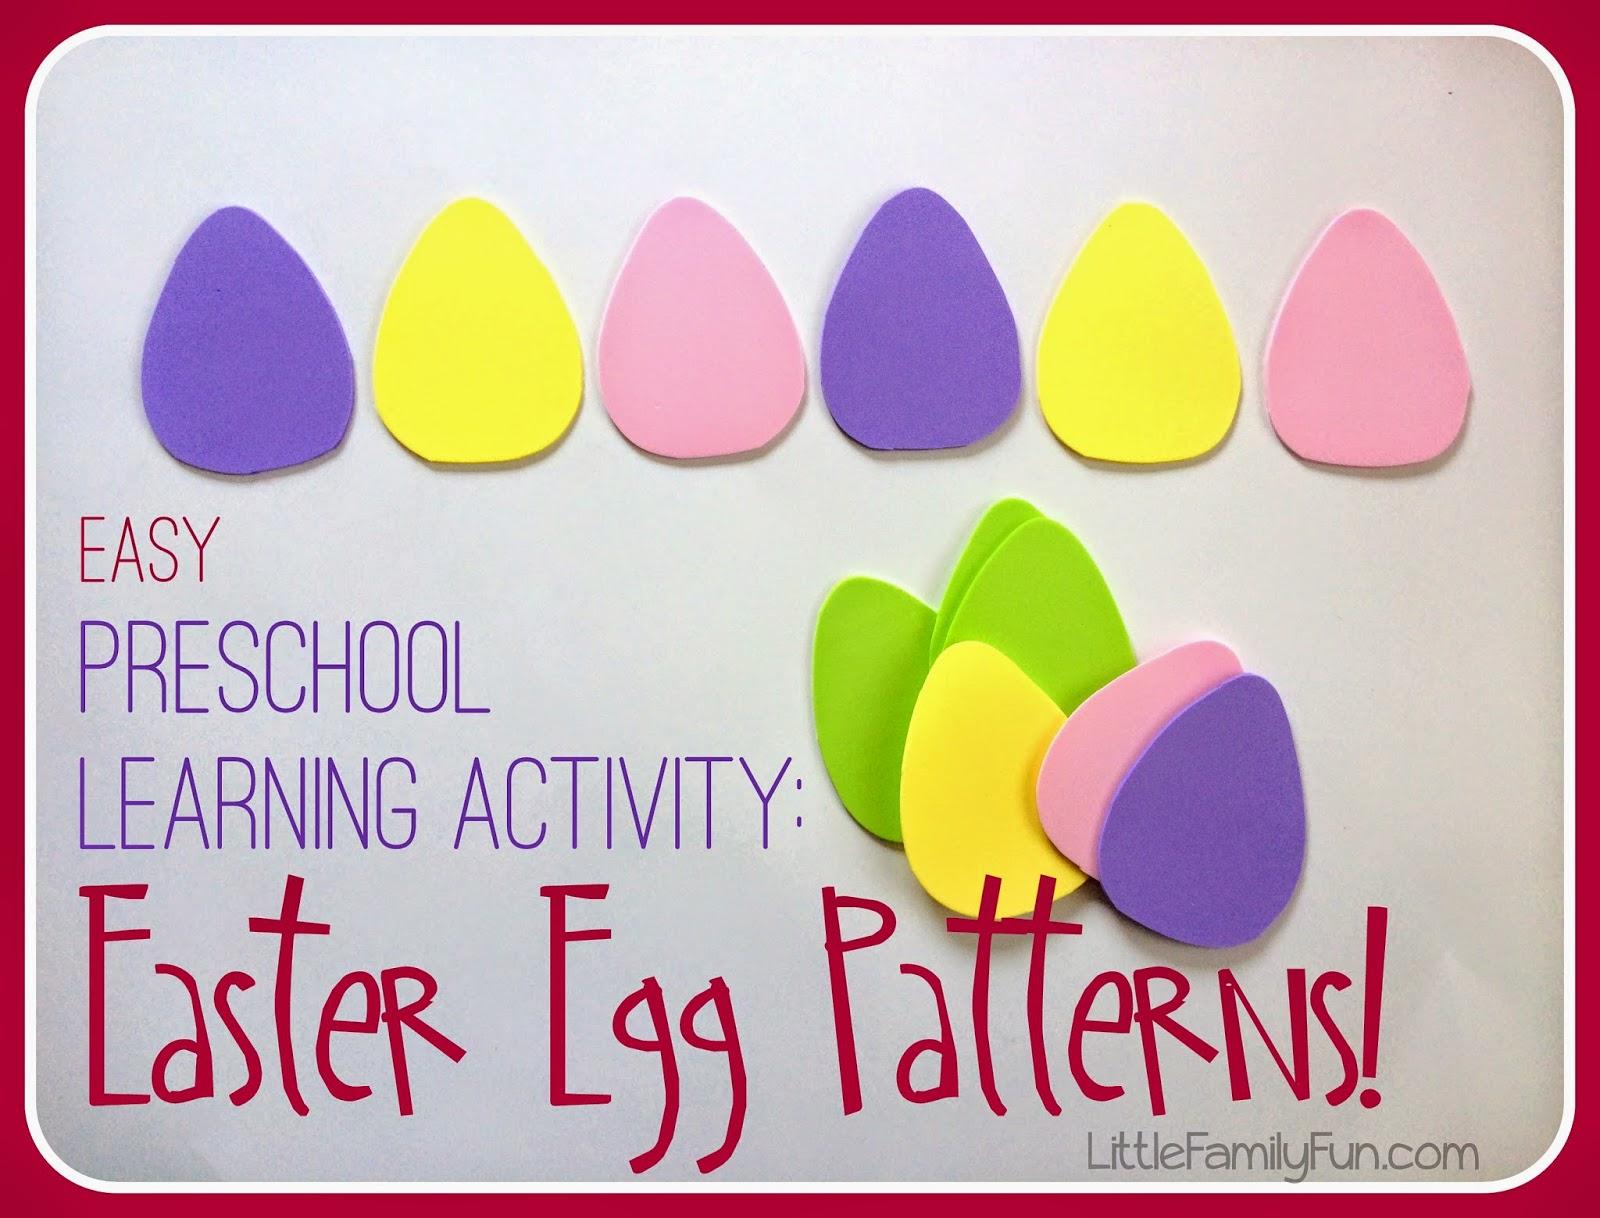 http://www.littlefamilyfun.com/2014/04/easter-egg-patterns.html